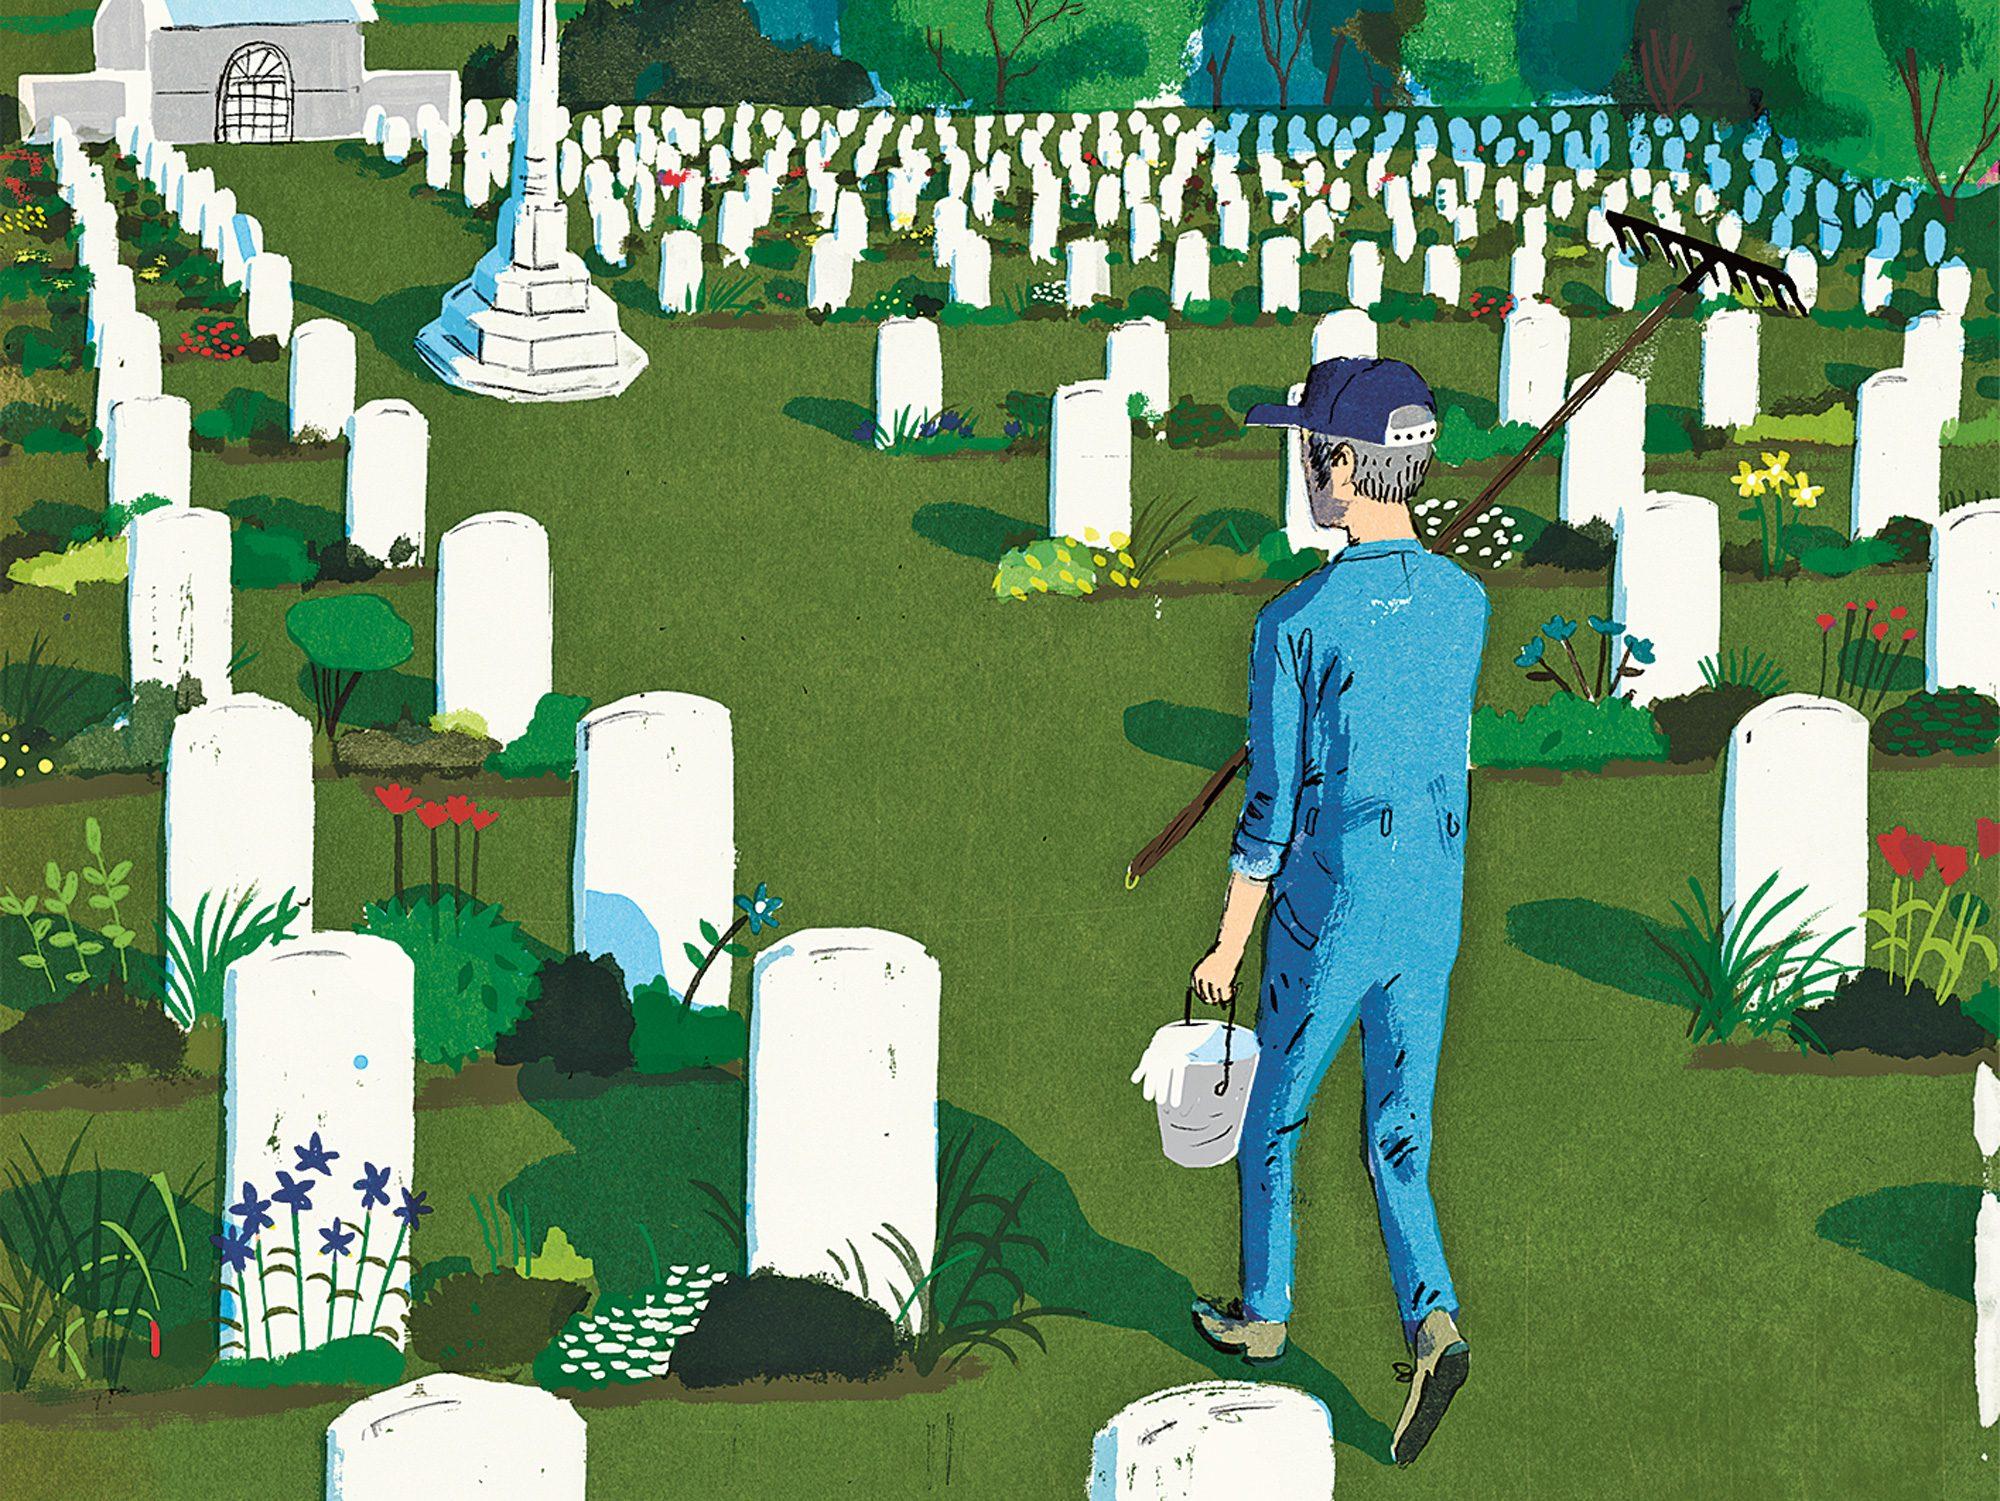 Remembering Canada's War Heroes